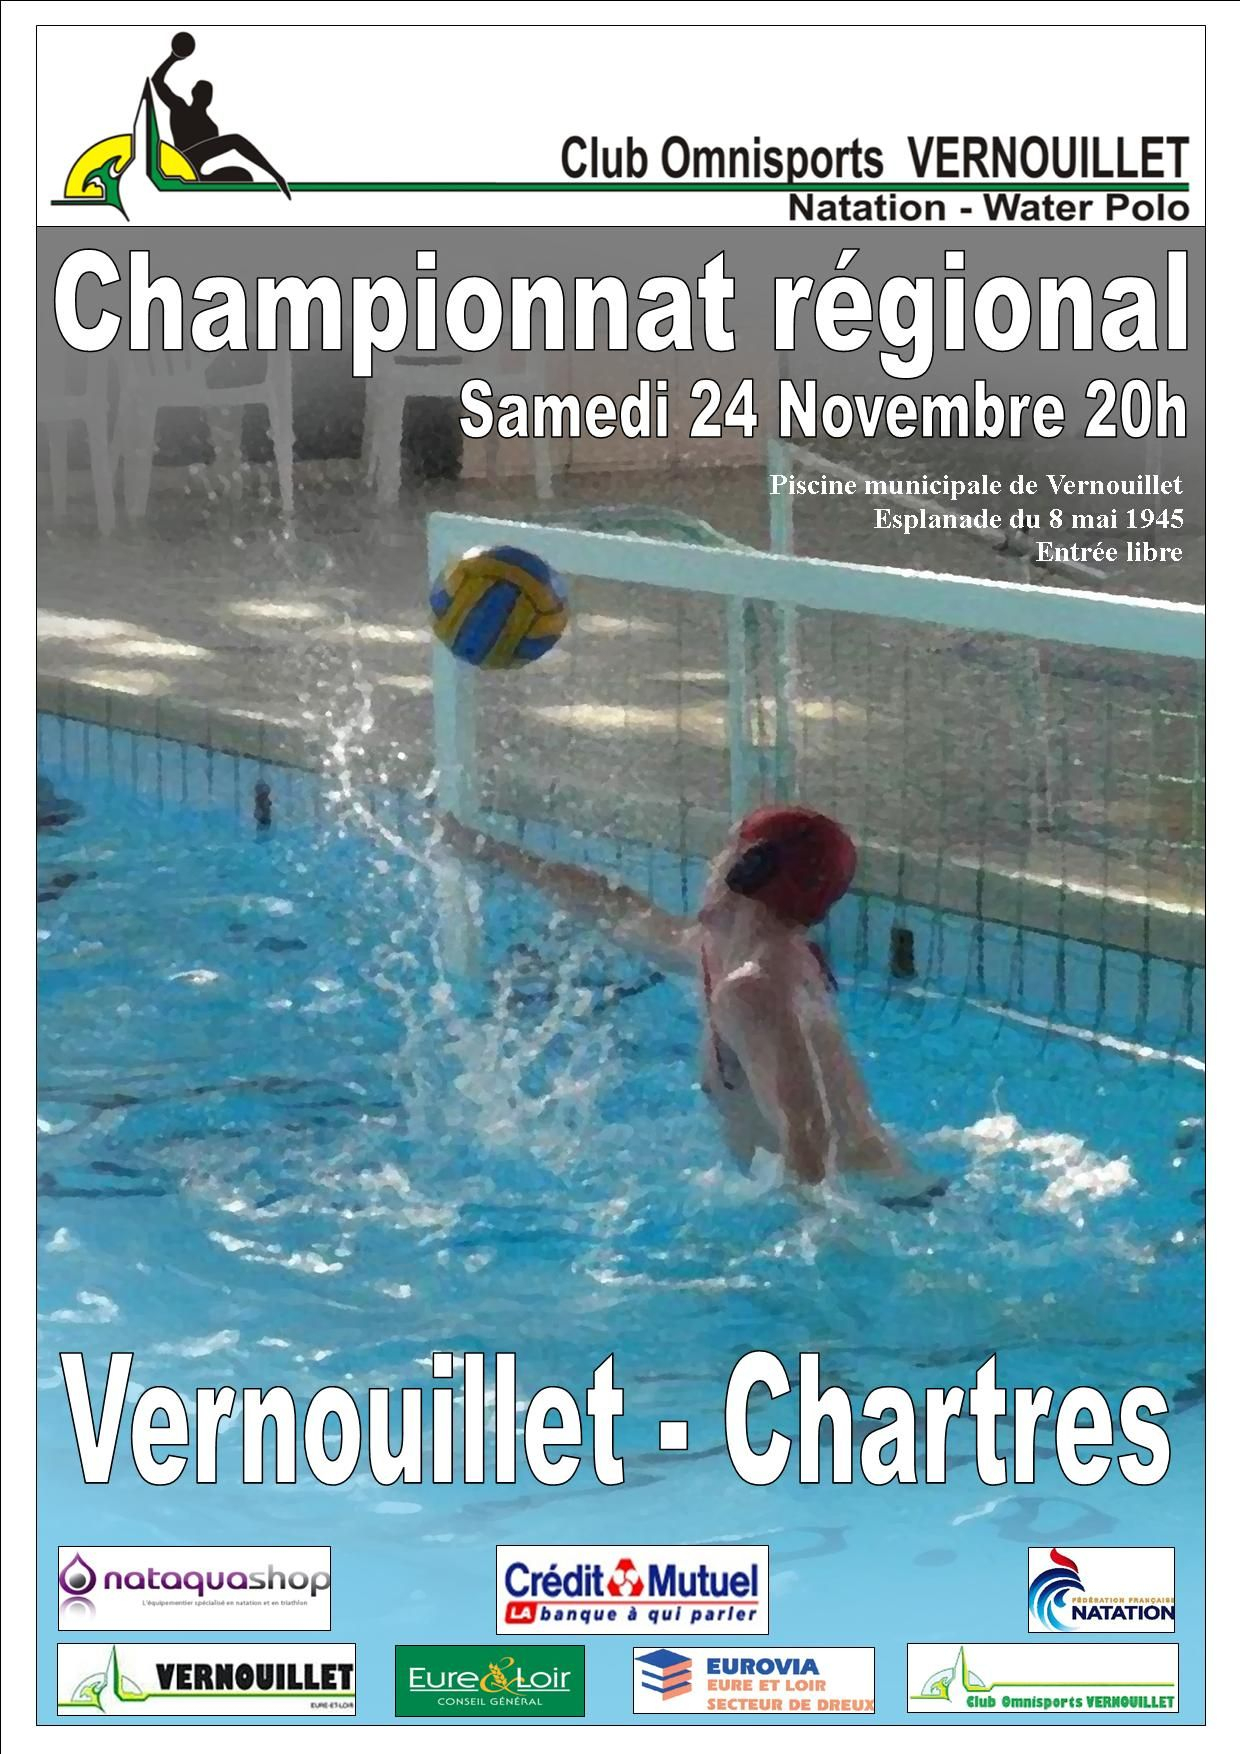 24/11/2012 Water-Polo : Vernouillet - Chartres | Cov ... avec Piscine Vernouillet